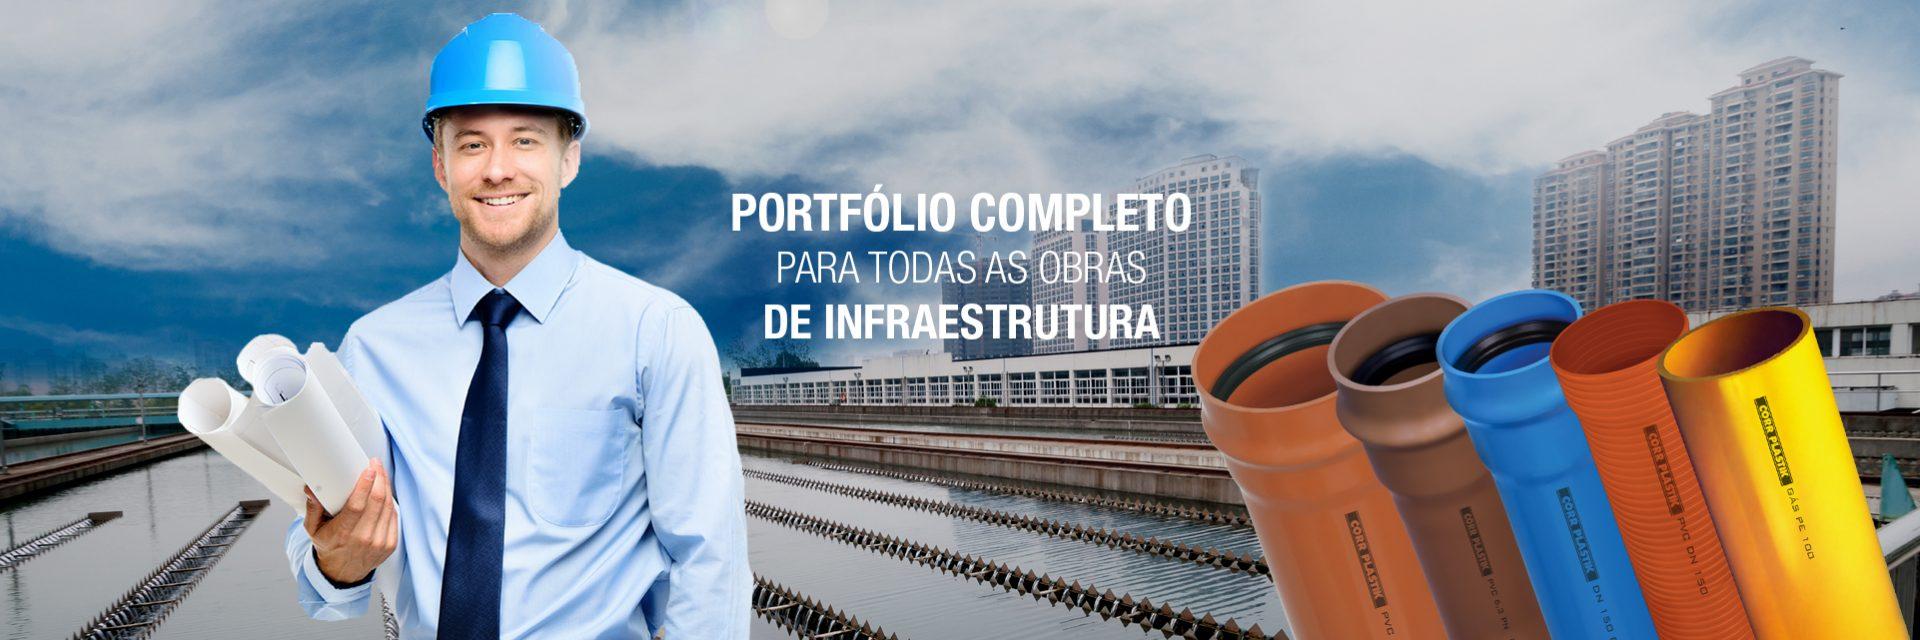 banner_infraestrutura